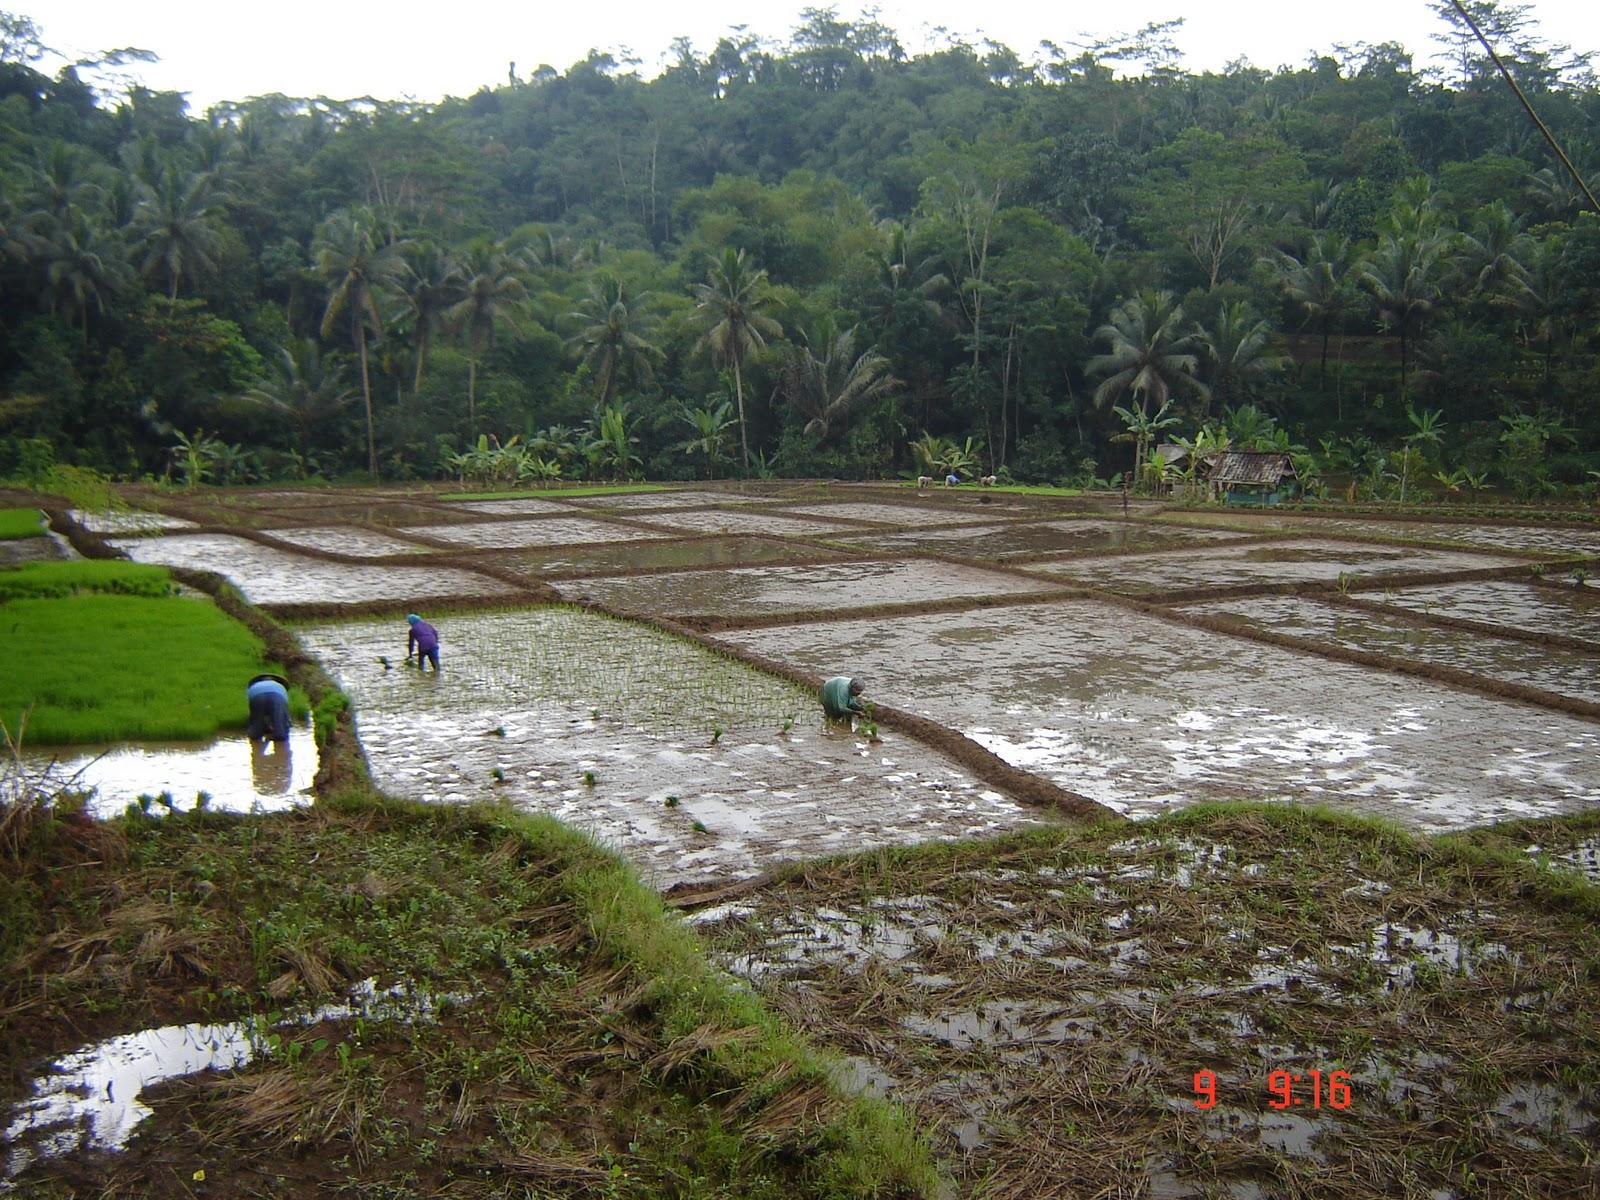 Wisata Desa Jelat Wisata Desa Jelat Ciamis Jawa Barat